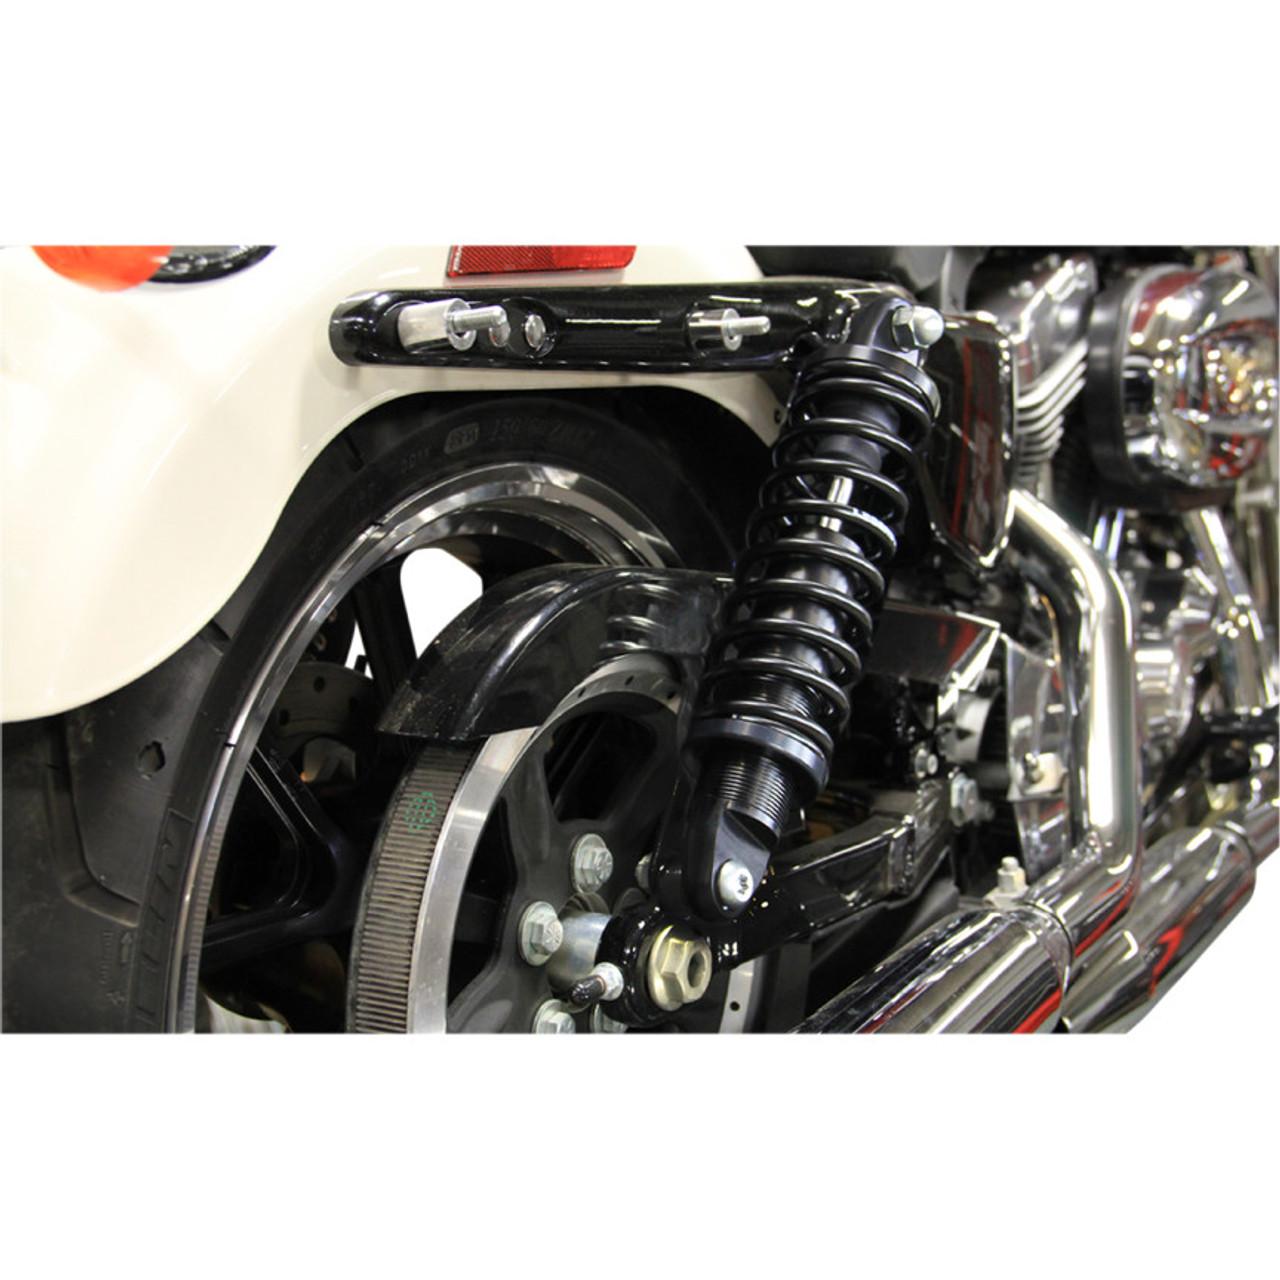 Legend Revo Shocks Coil Suspension for 2004-2017 Harley Sportster